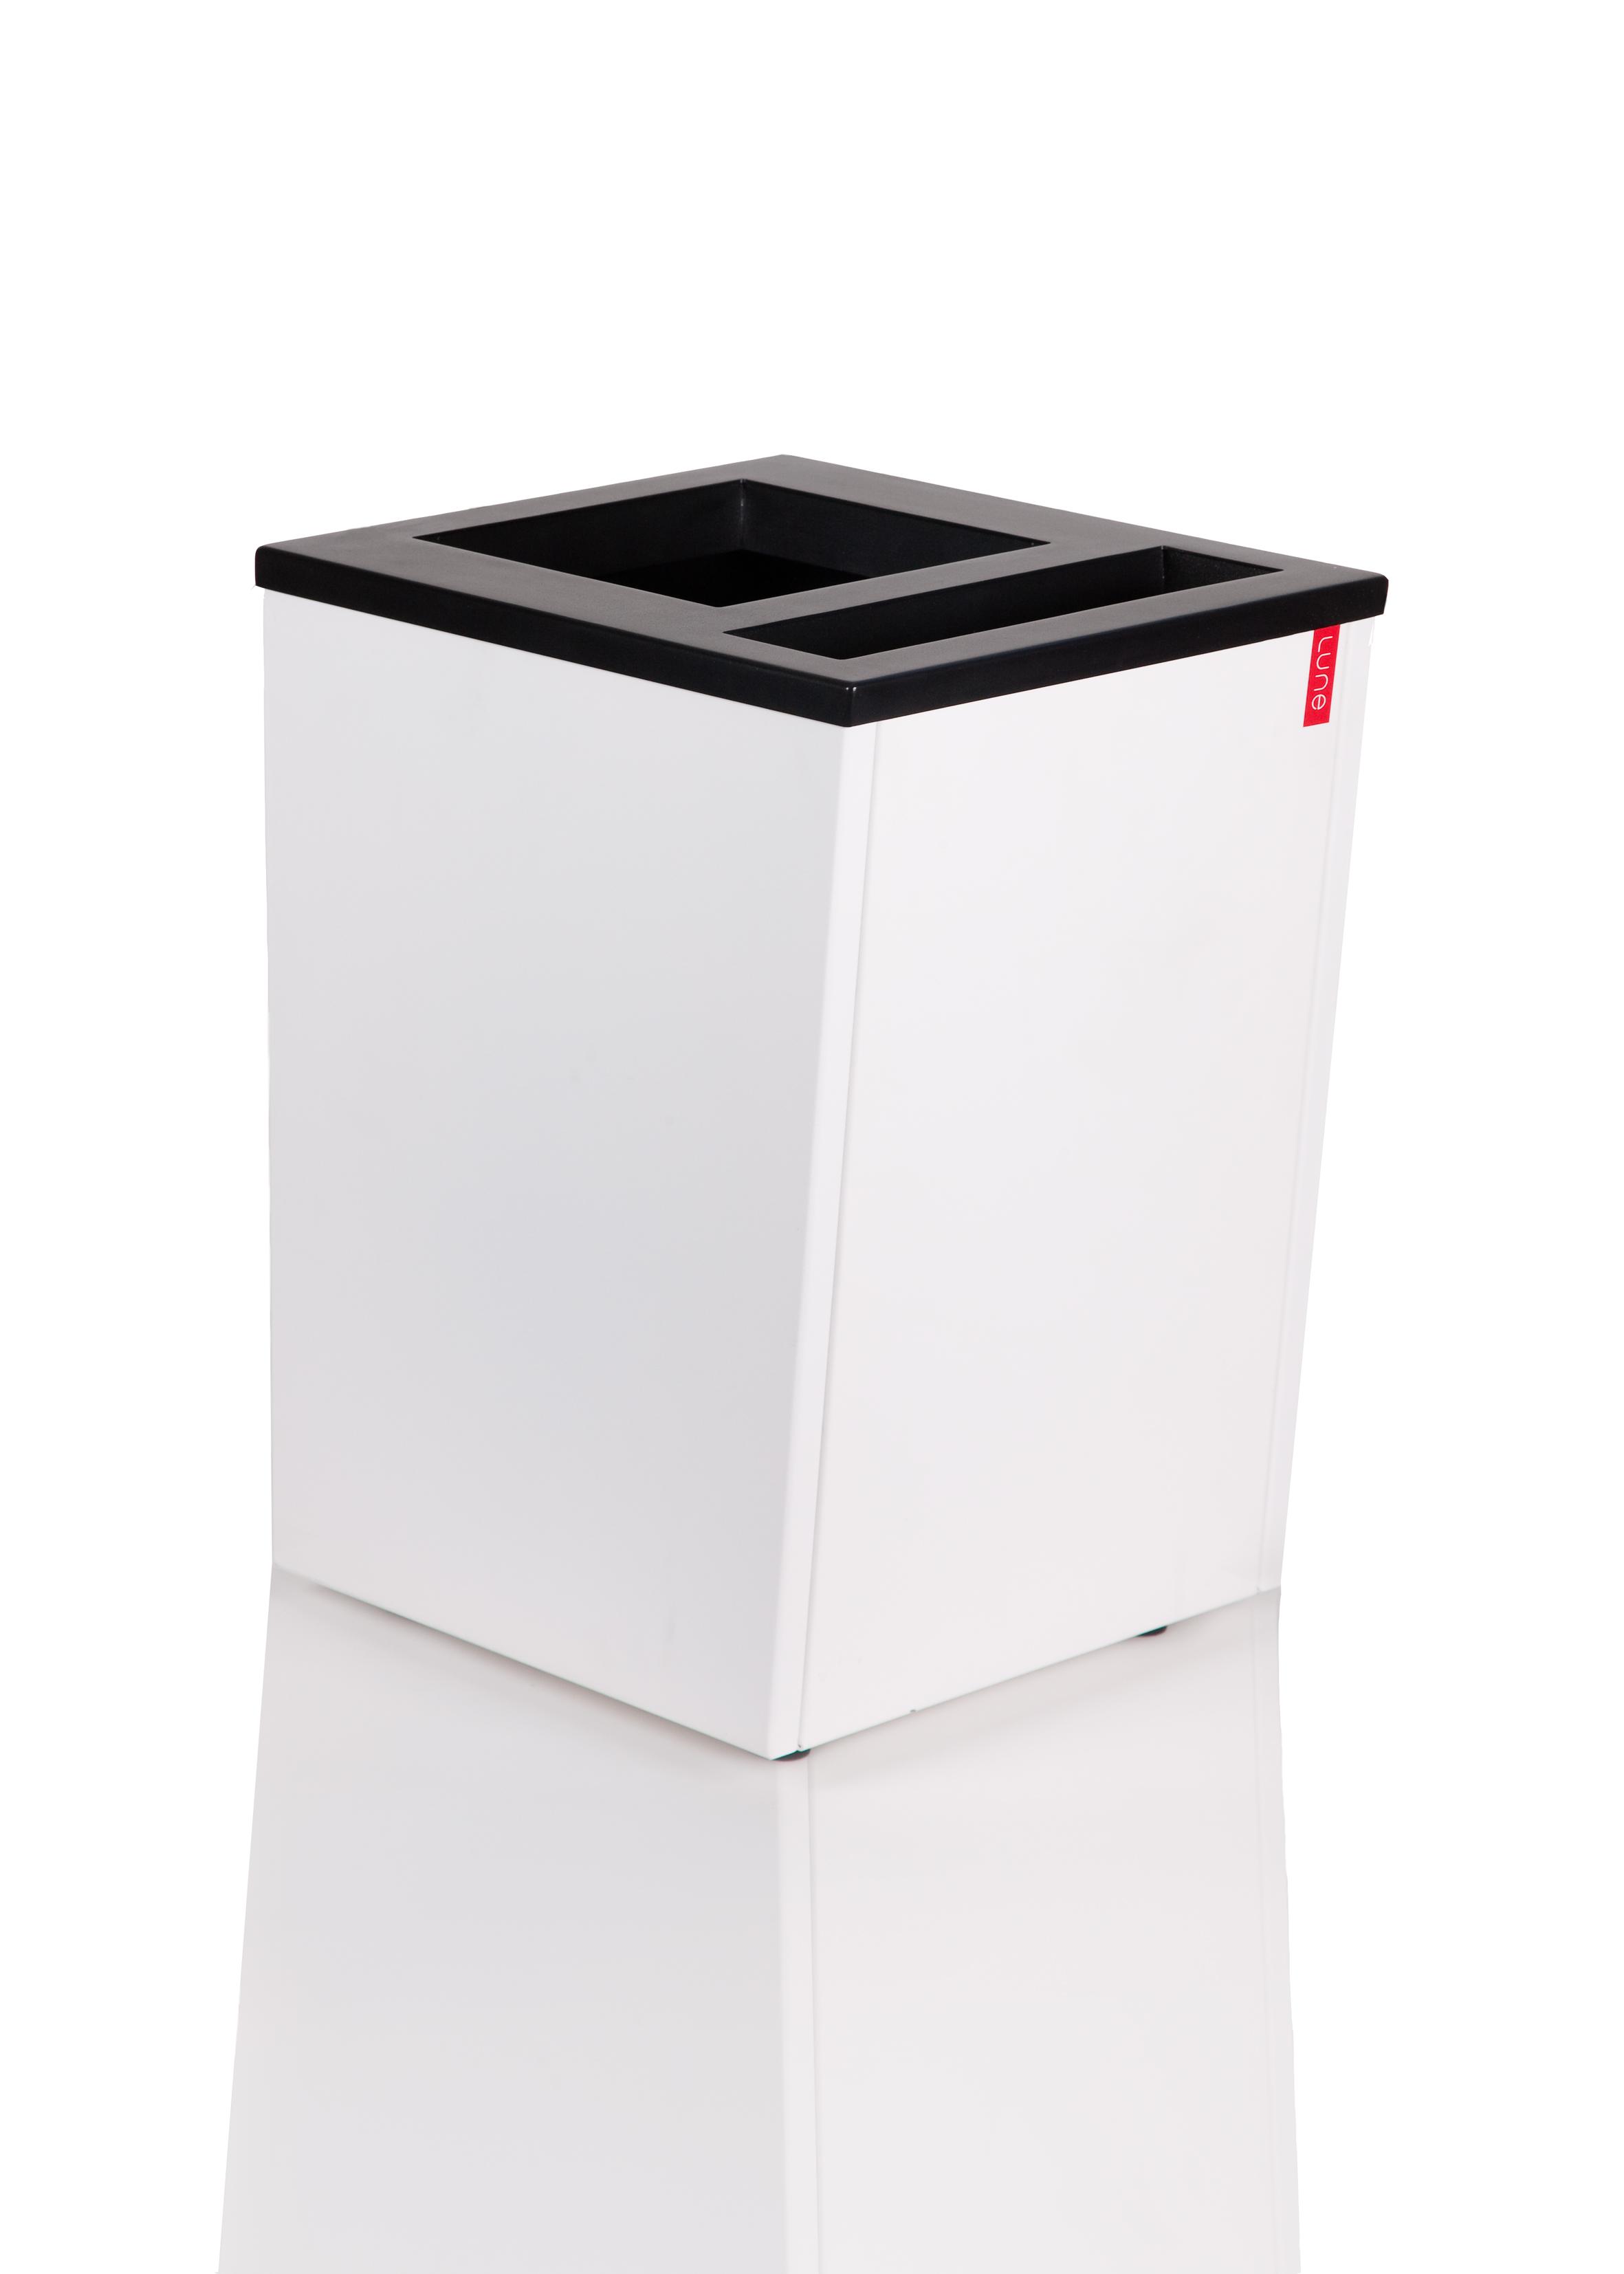 Afvalbak Artho wit, duo afvalbak